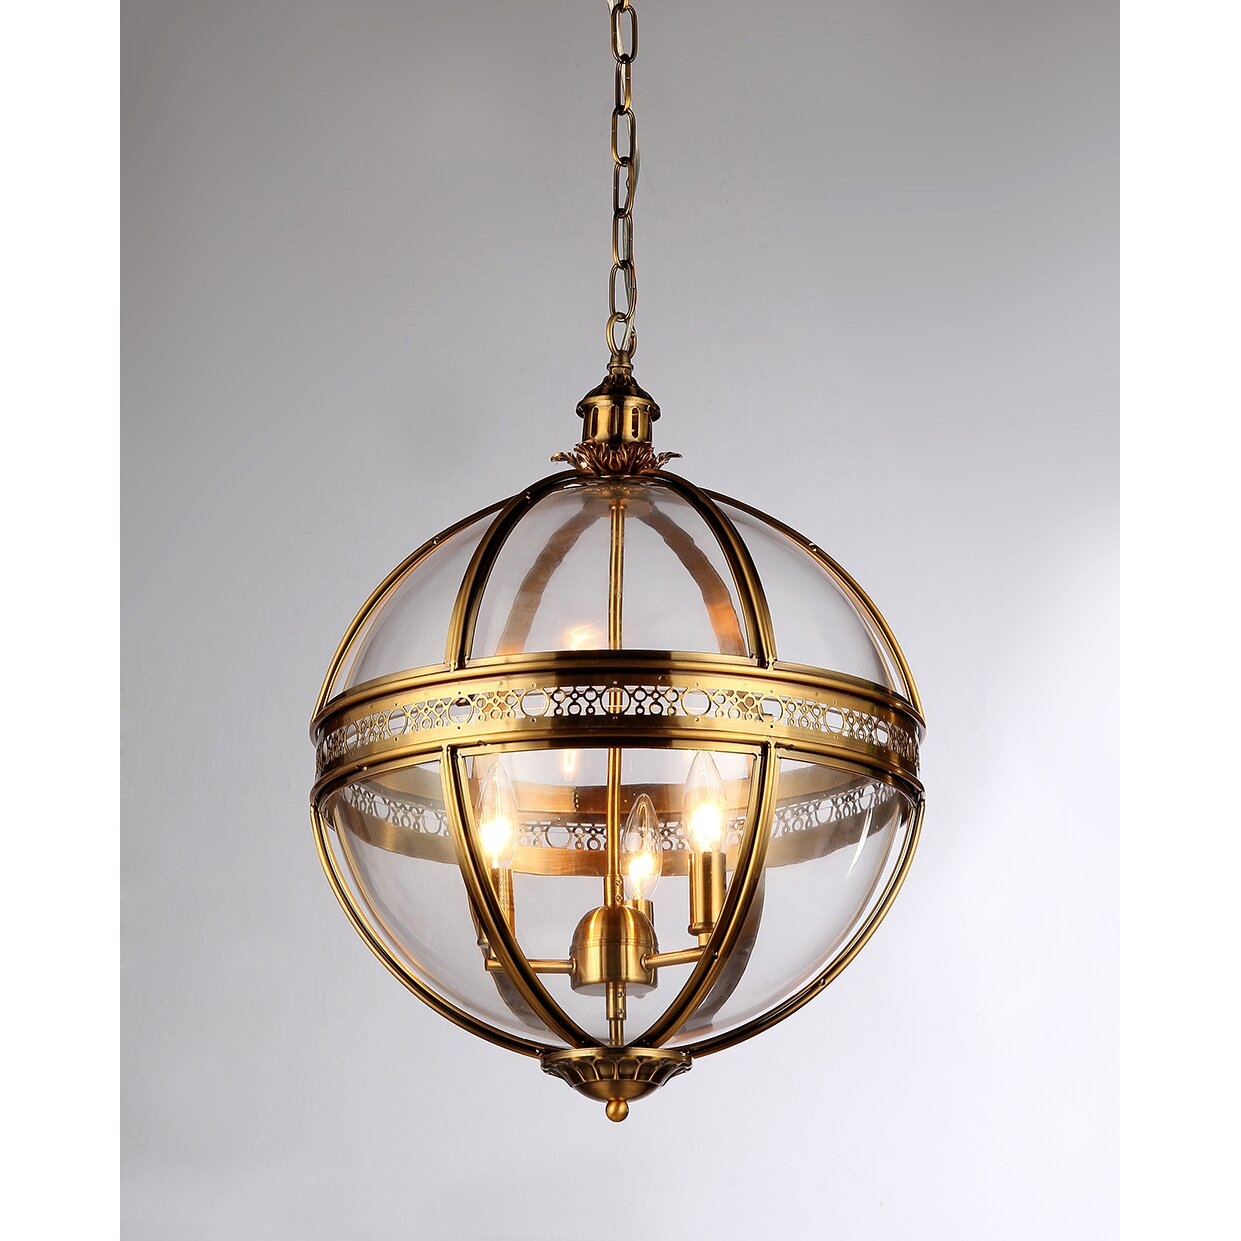 Warehouse of Tiffany 3 Light Williams Chandelier & Reviews | Wayfair